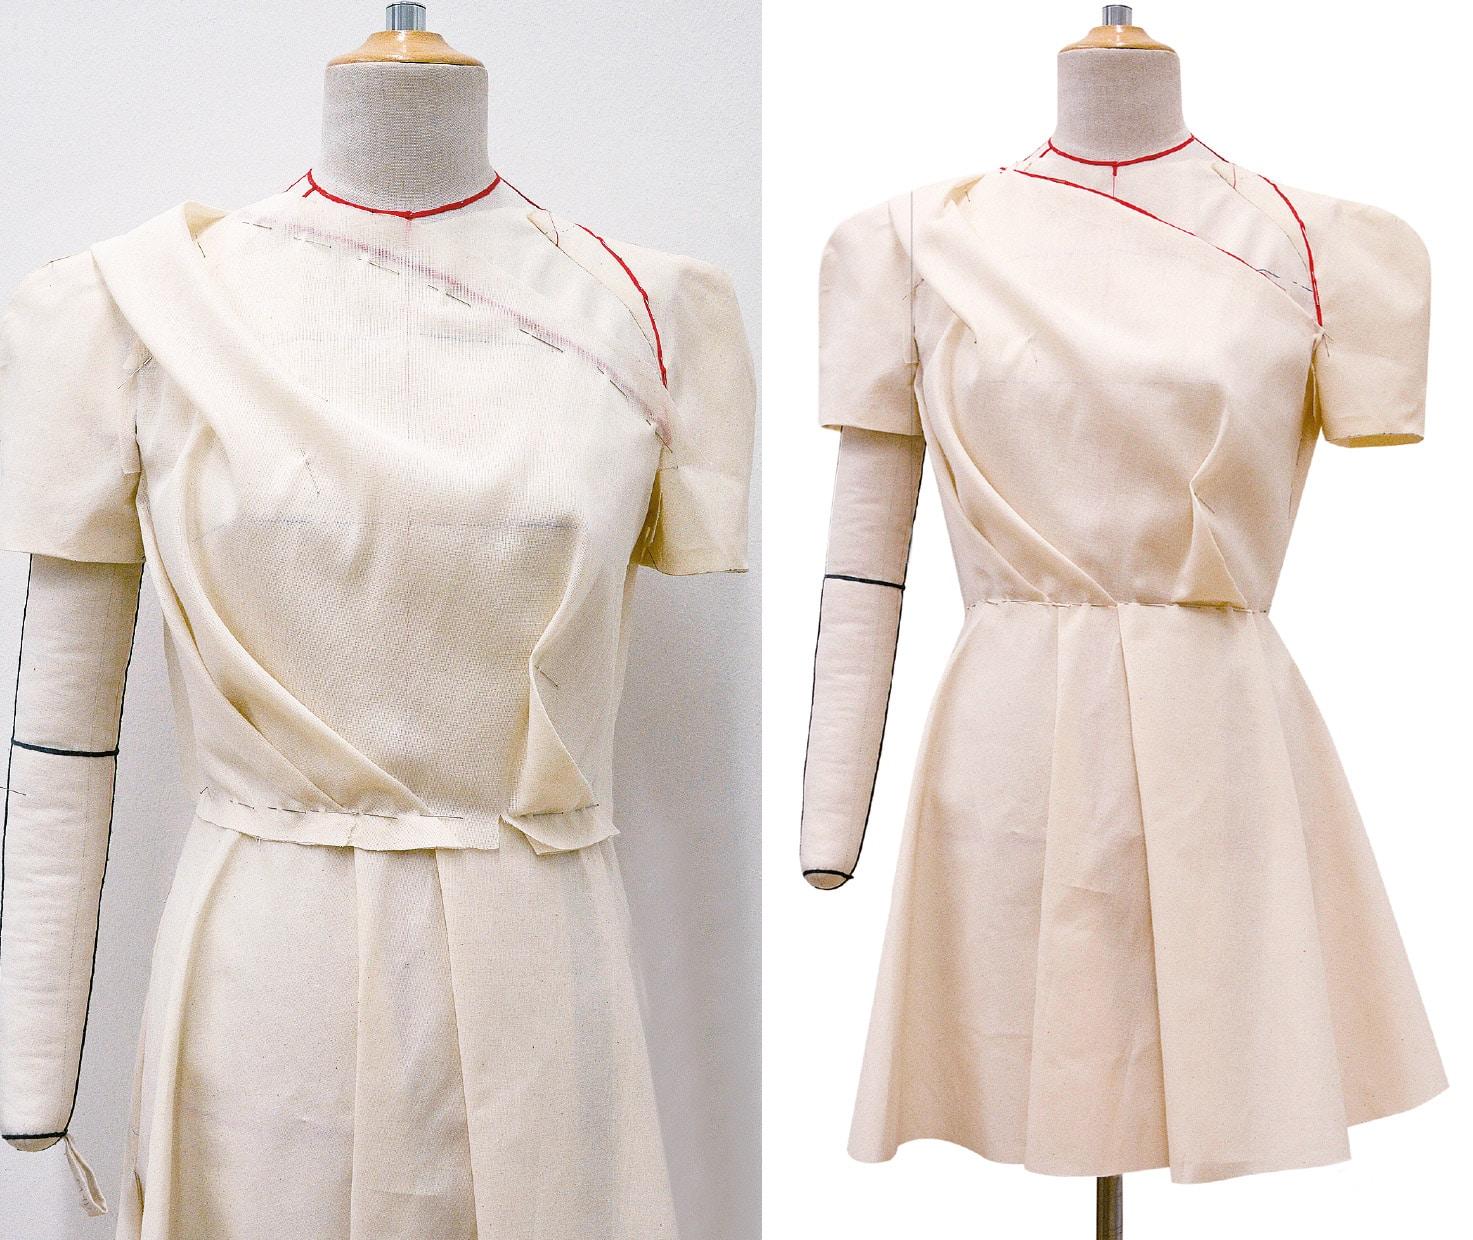 Kleid Drapage Tutorial Step 41-42